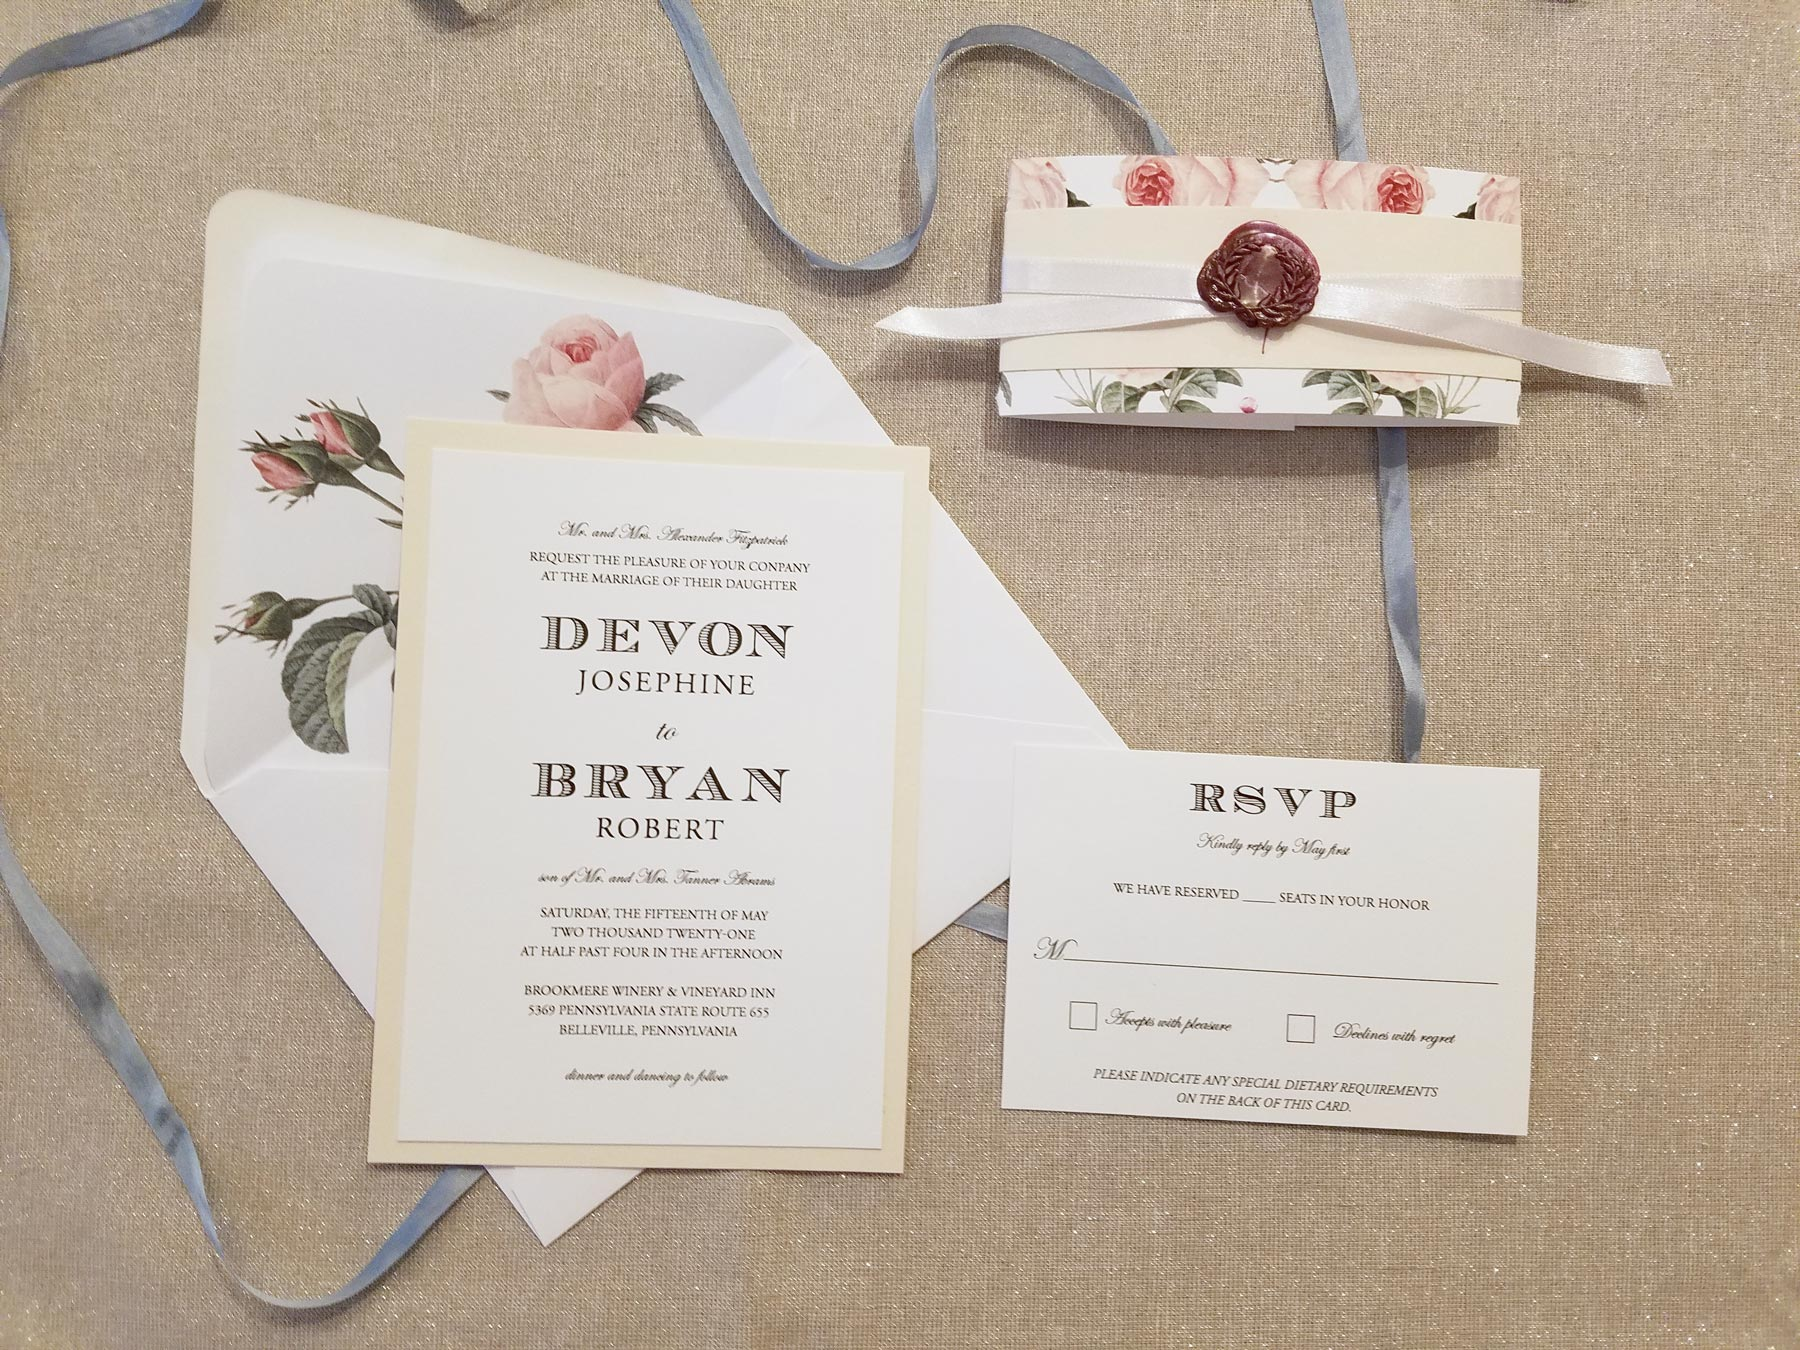 the-devon-wedding-invitation-suite-1